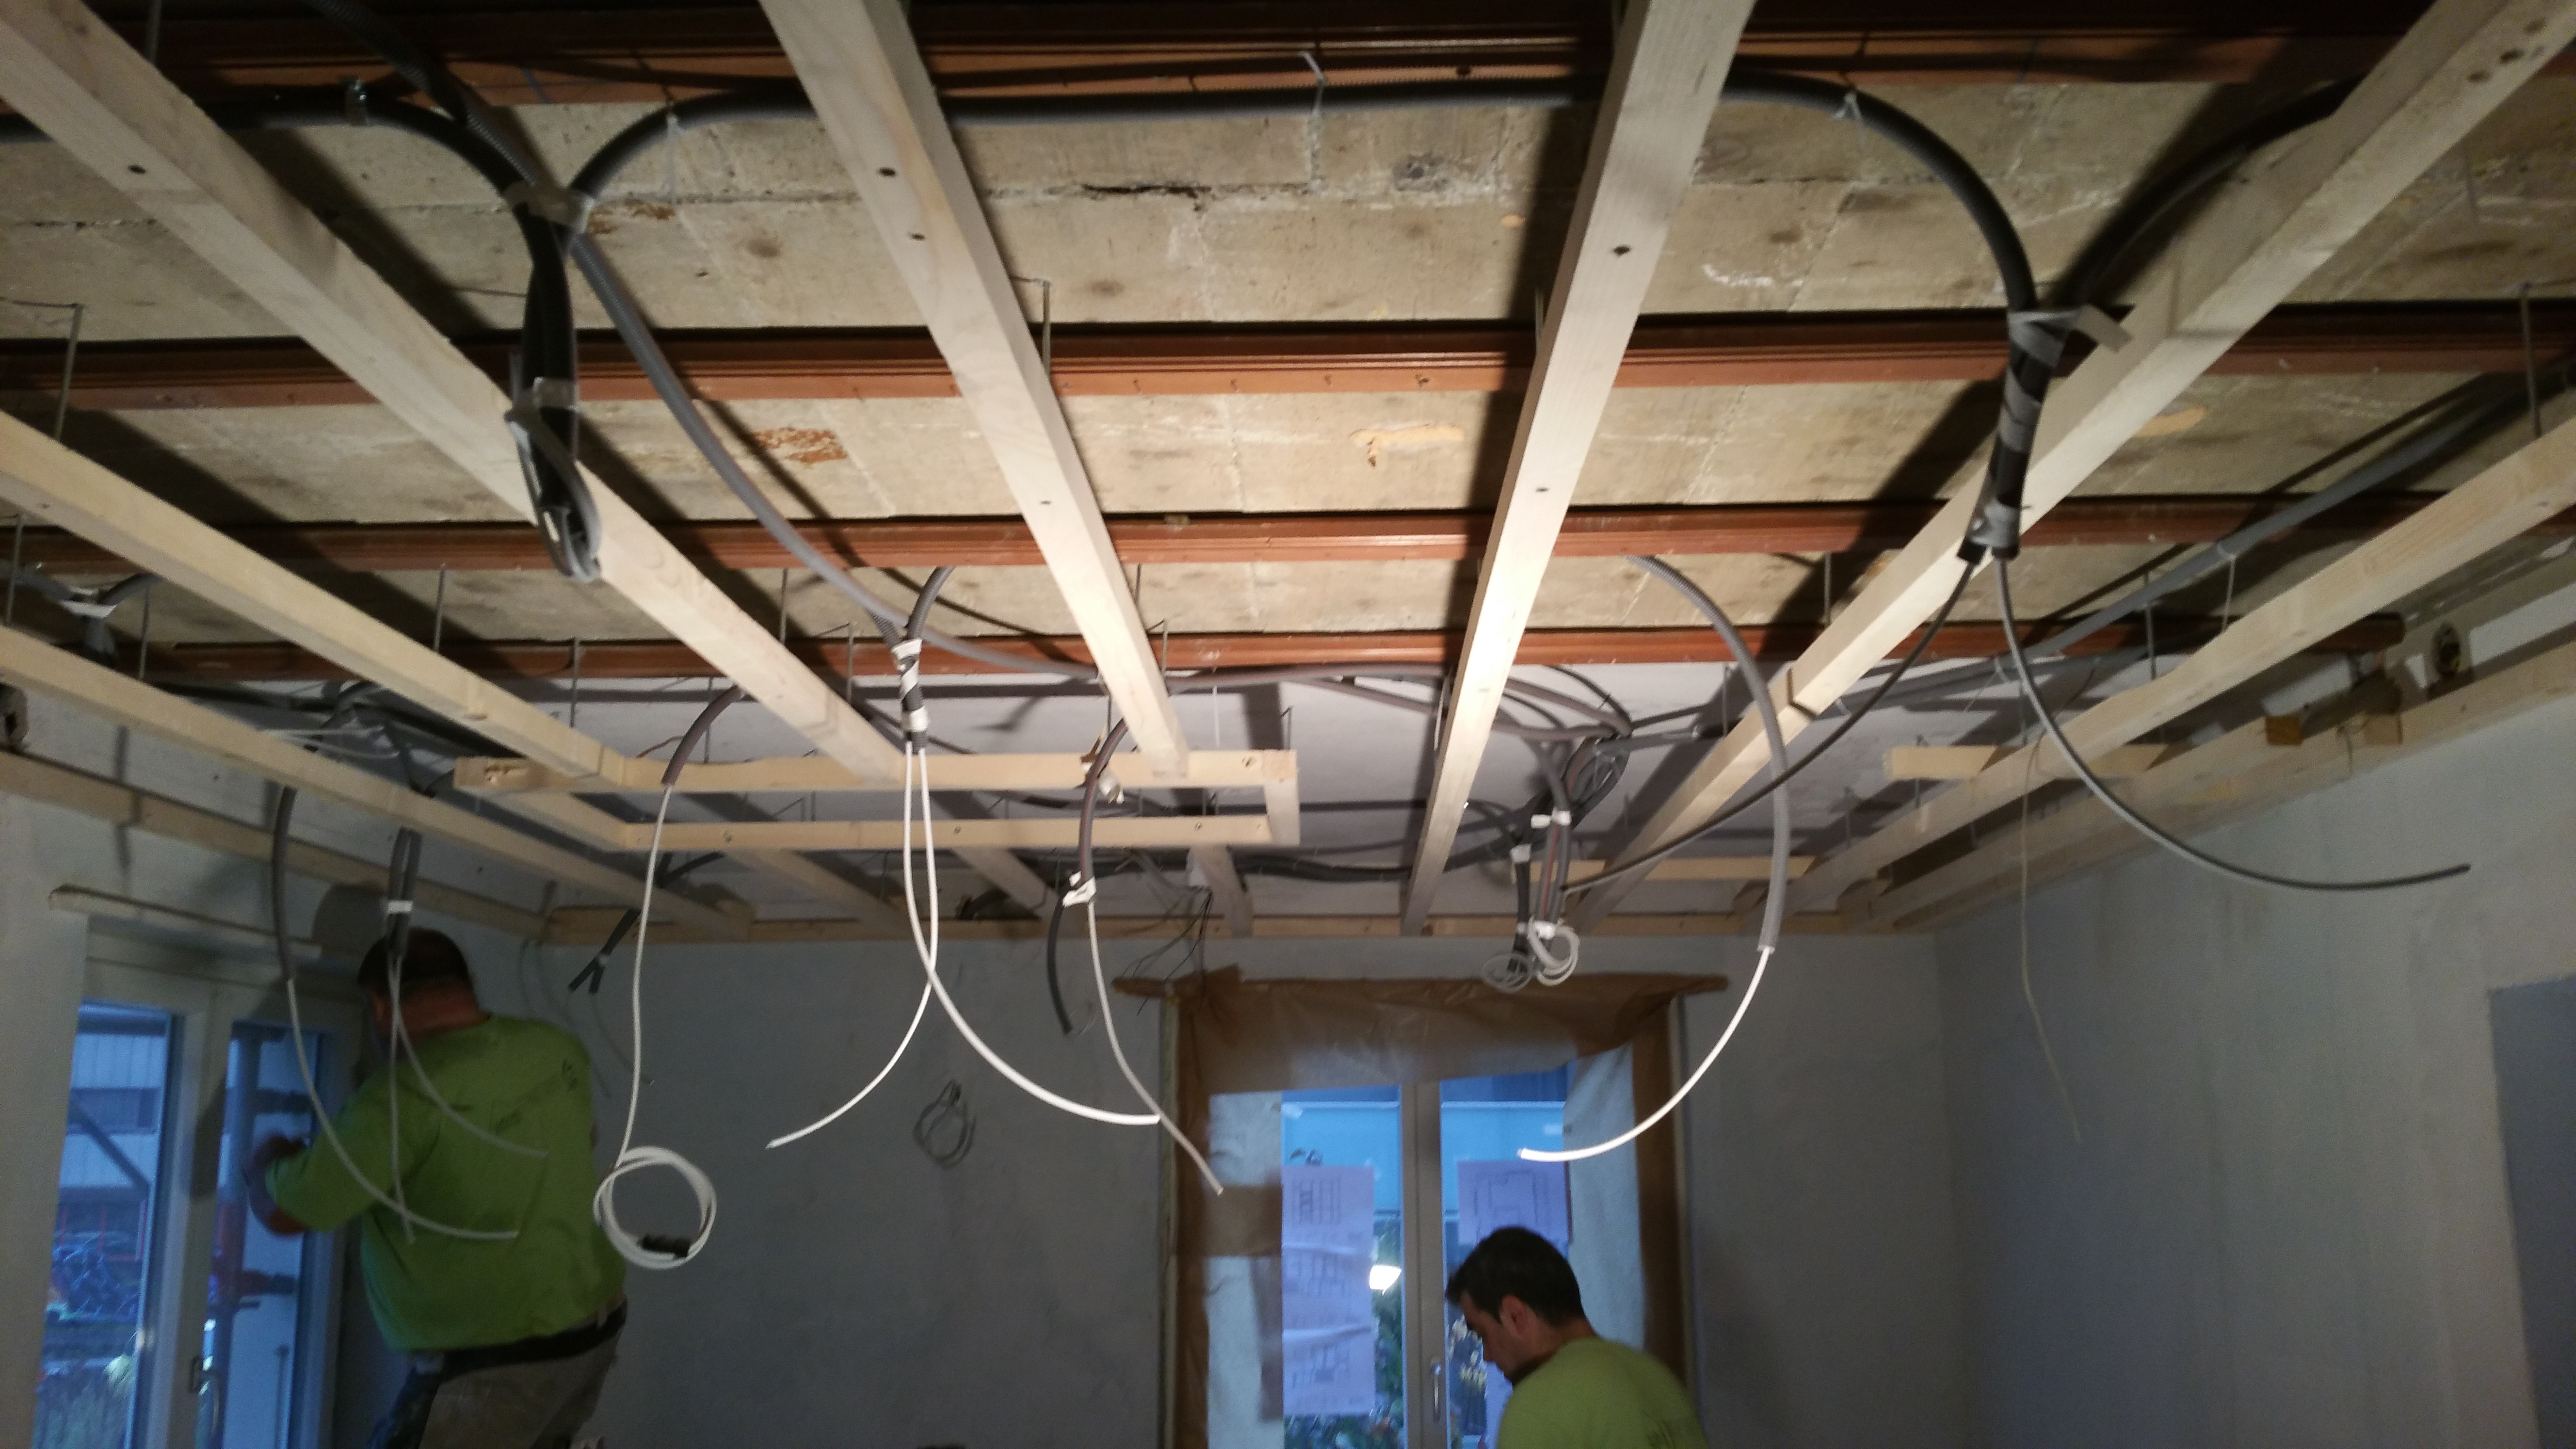 Umbauen, Renovieren, Sanieren